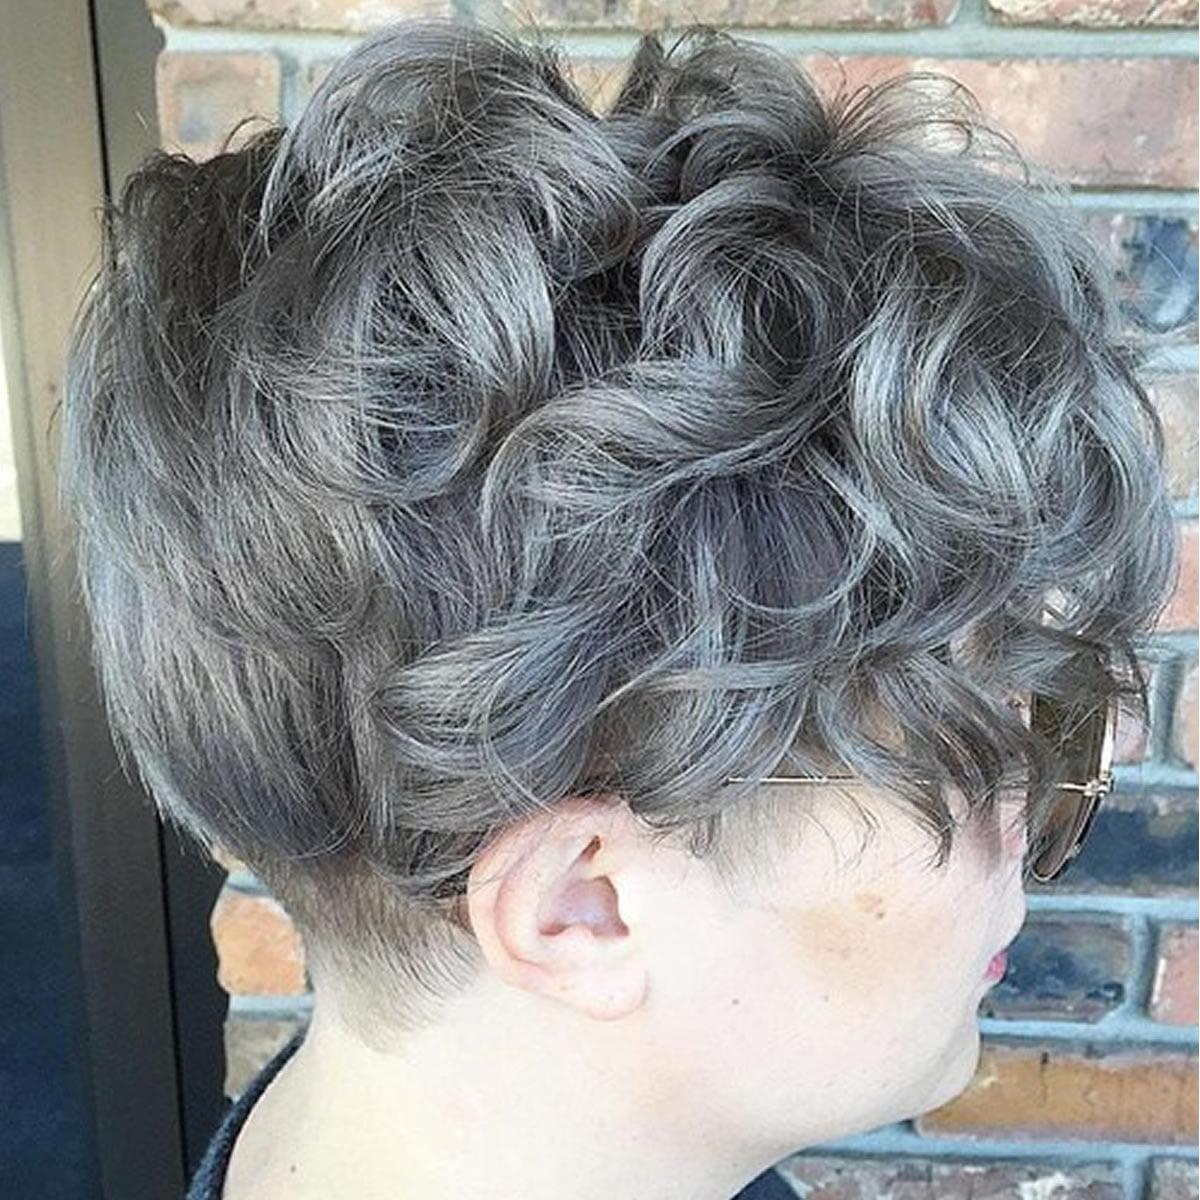 Grey Hair Trend 20 Glamorous Hairstyles For Women 2020